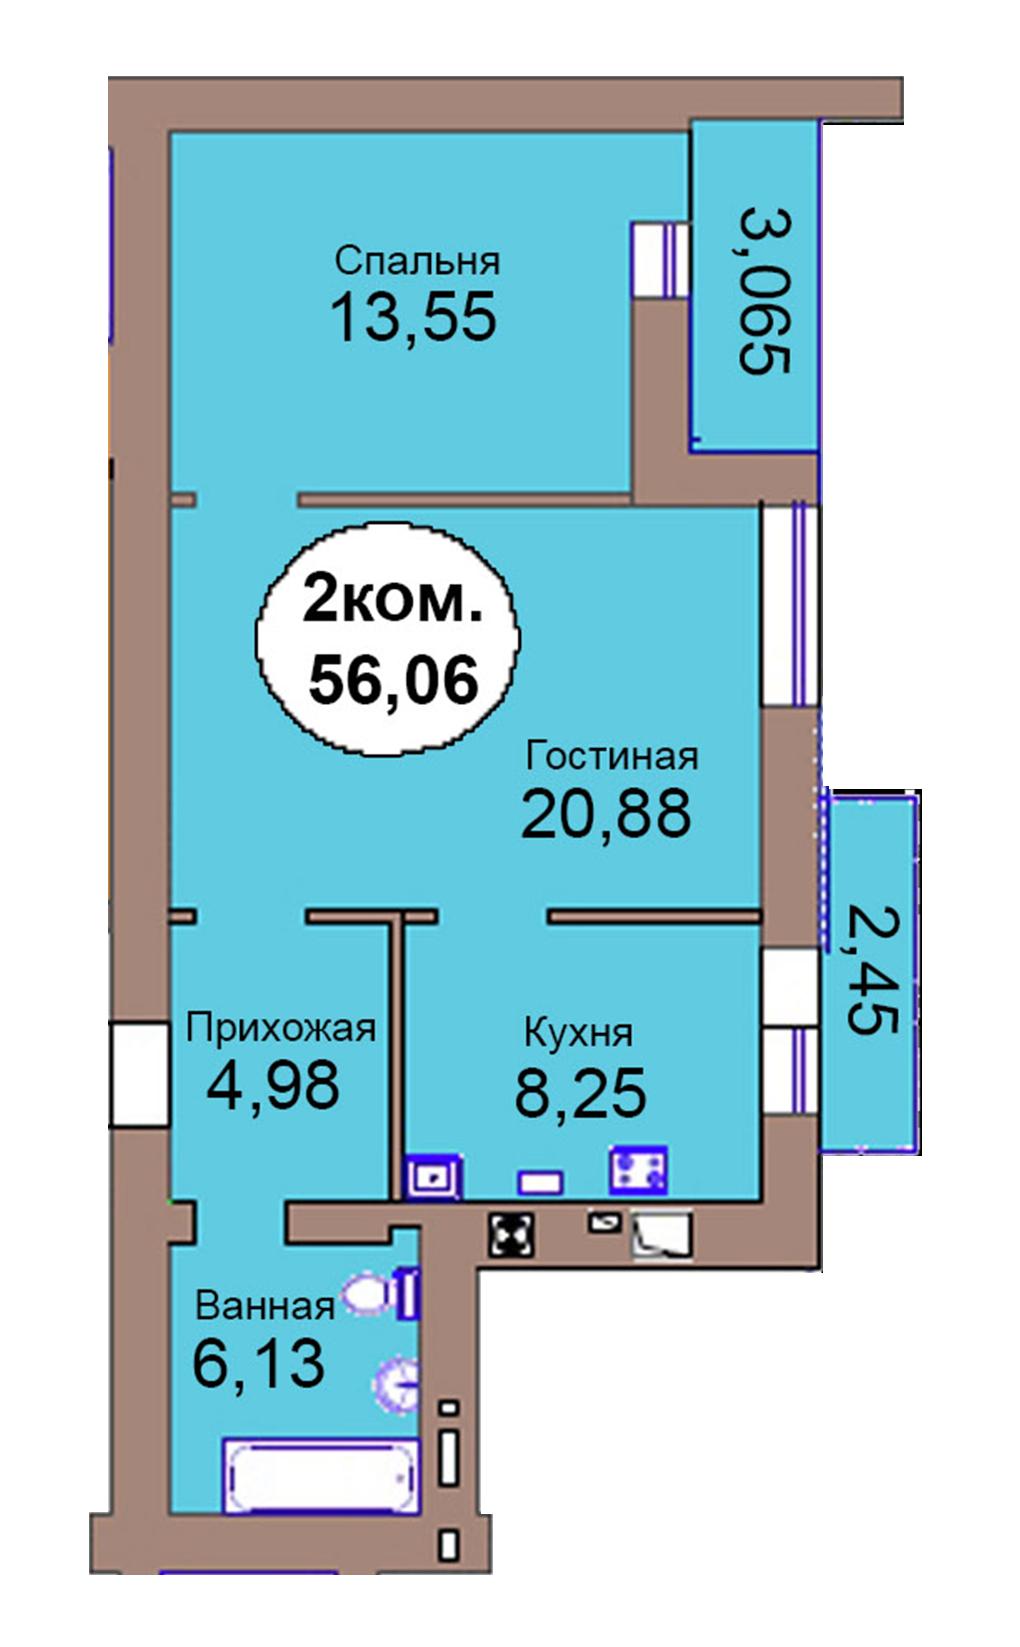 2-комн. кв. по пер. Калининградский, 4  кв. 126 в Калининграде